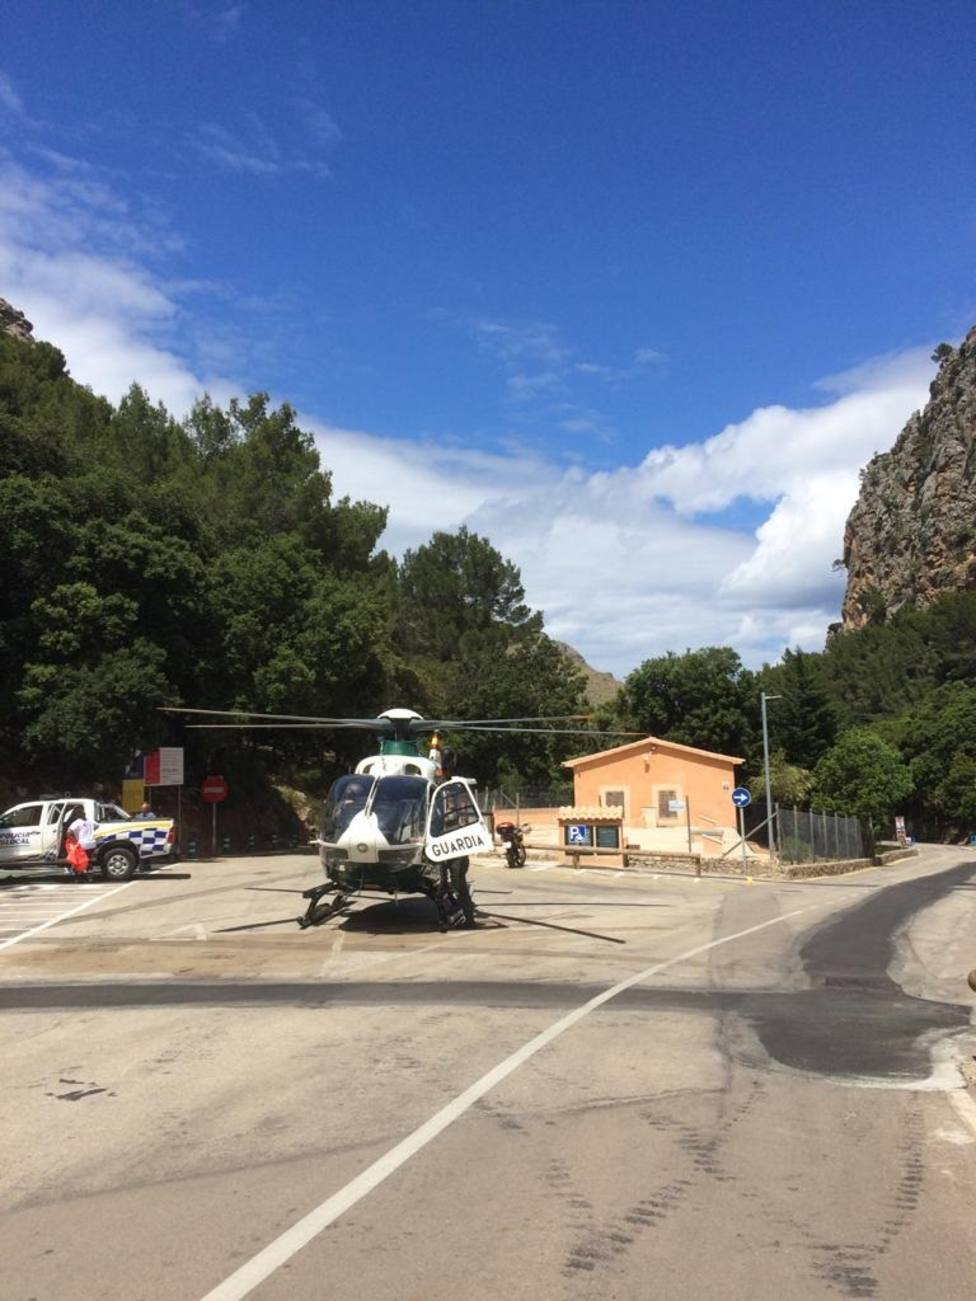 Evacuado un bebé de 19 meses al caer de una altura de siete metros en Sa Calobra (Mallorca)